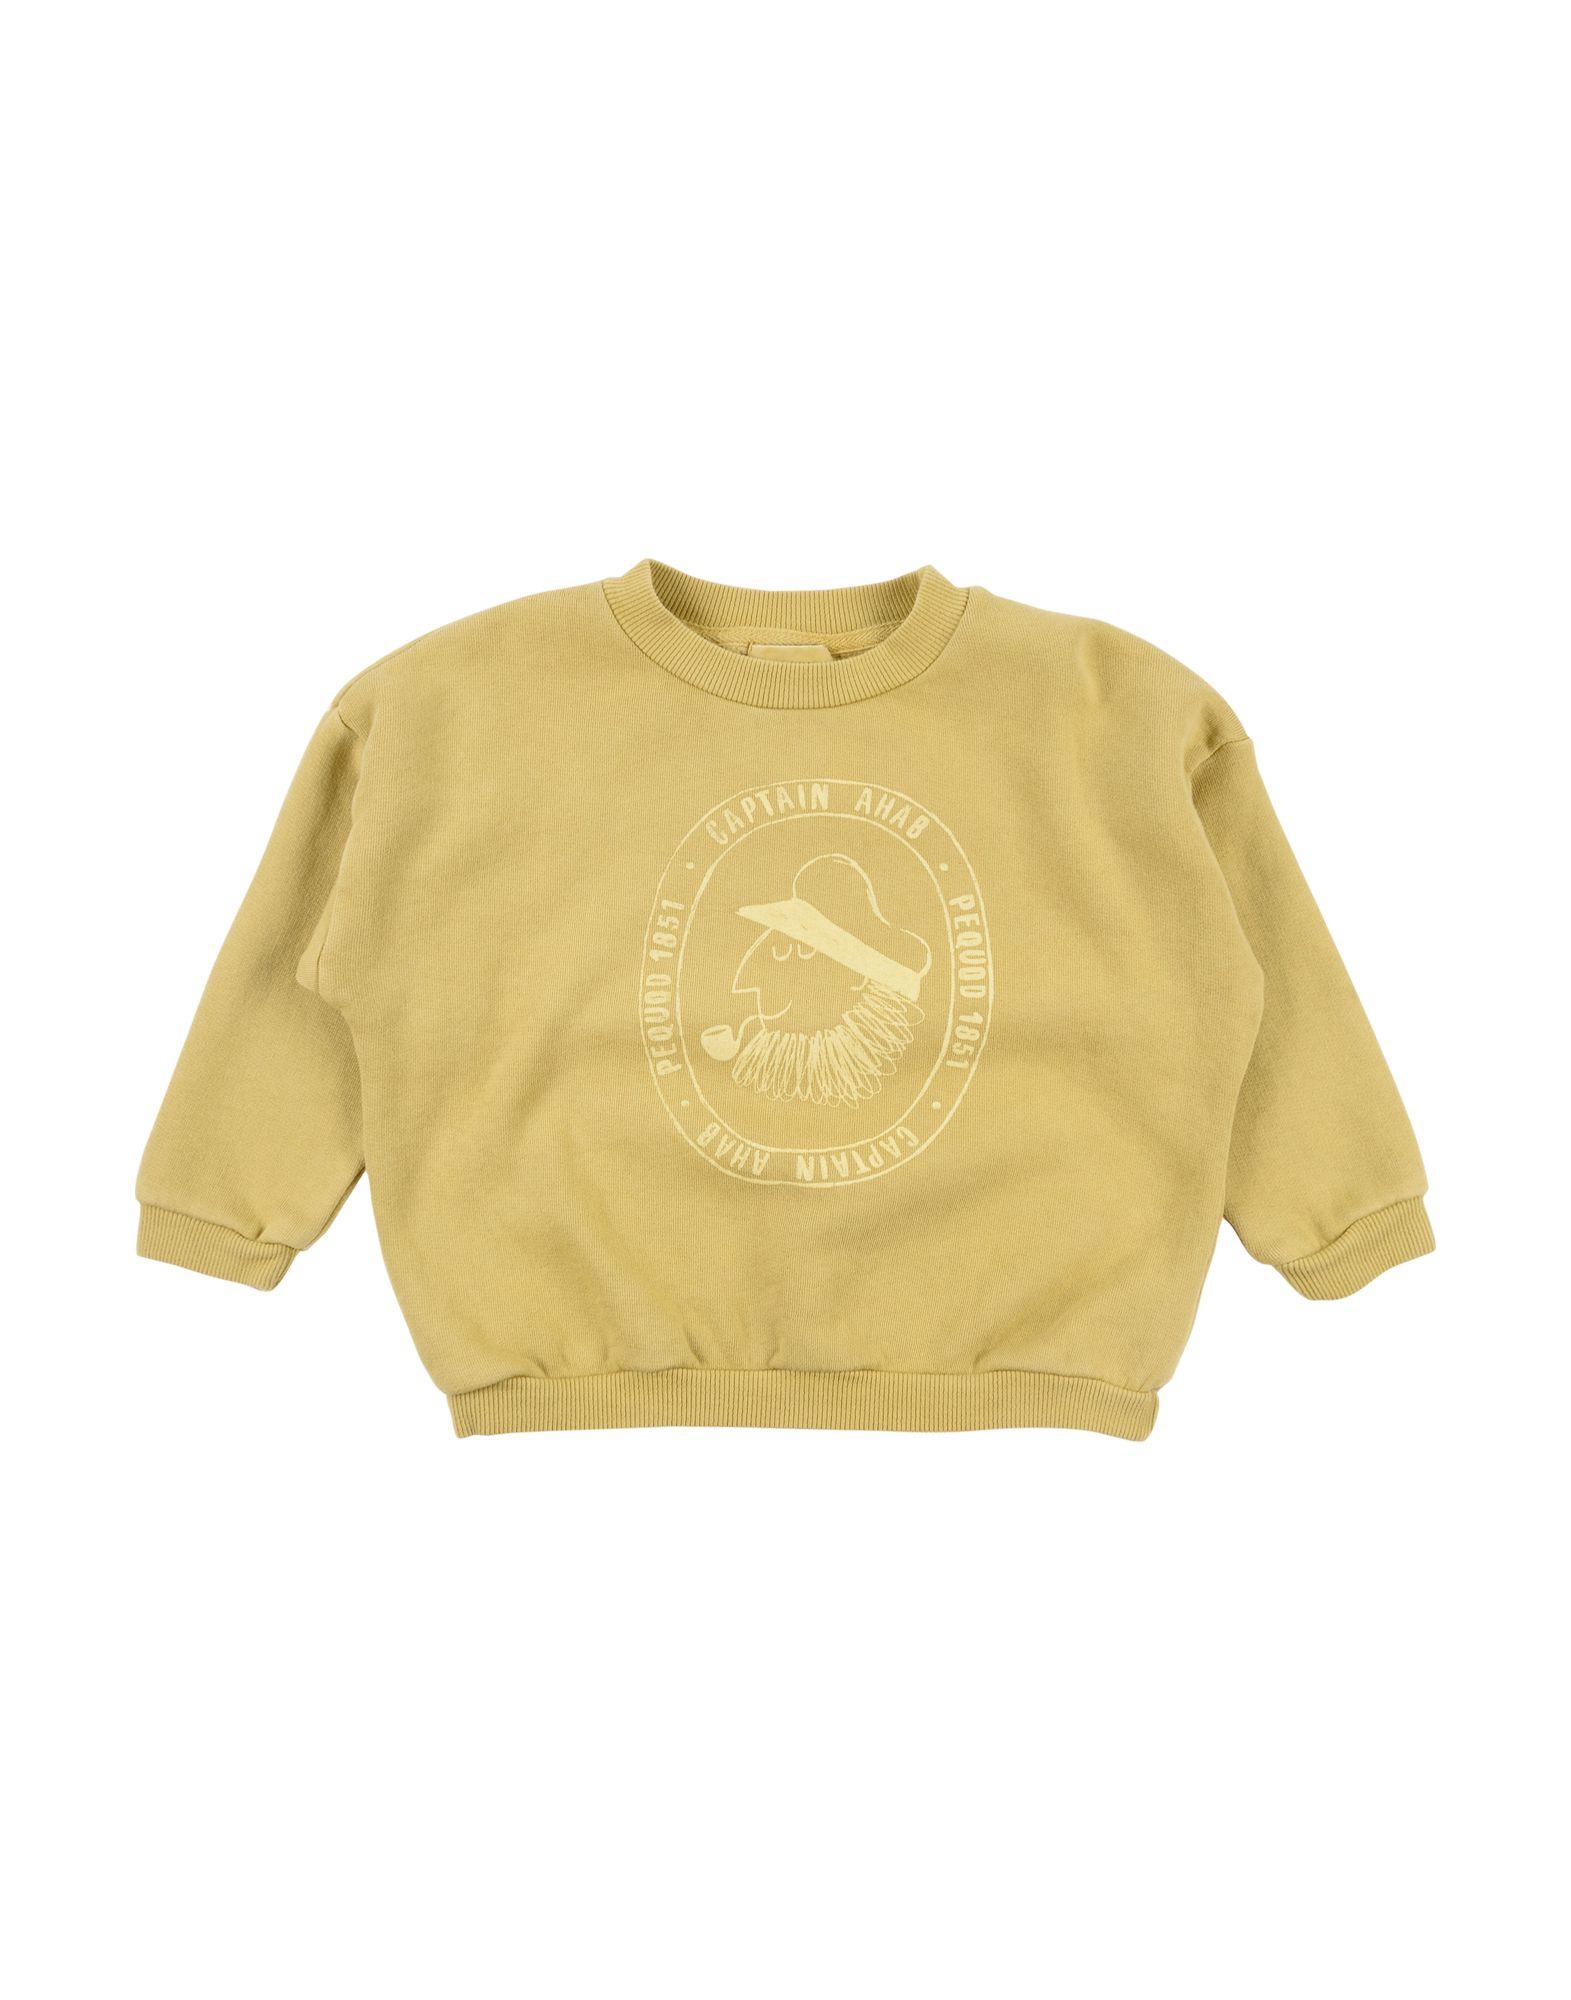 BOBO CHOSES Jungen 0-24 monate Sweatshirt10